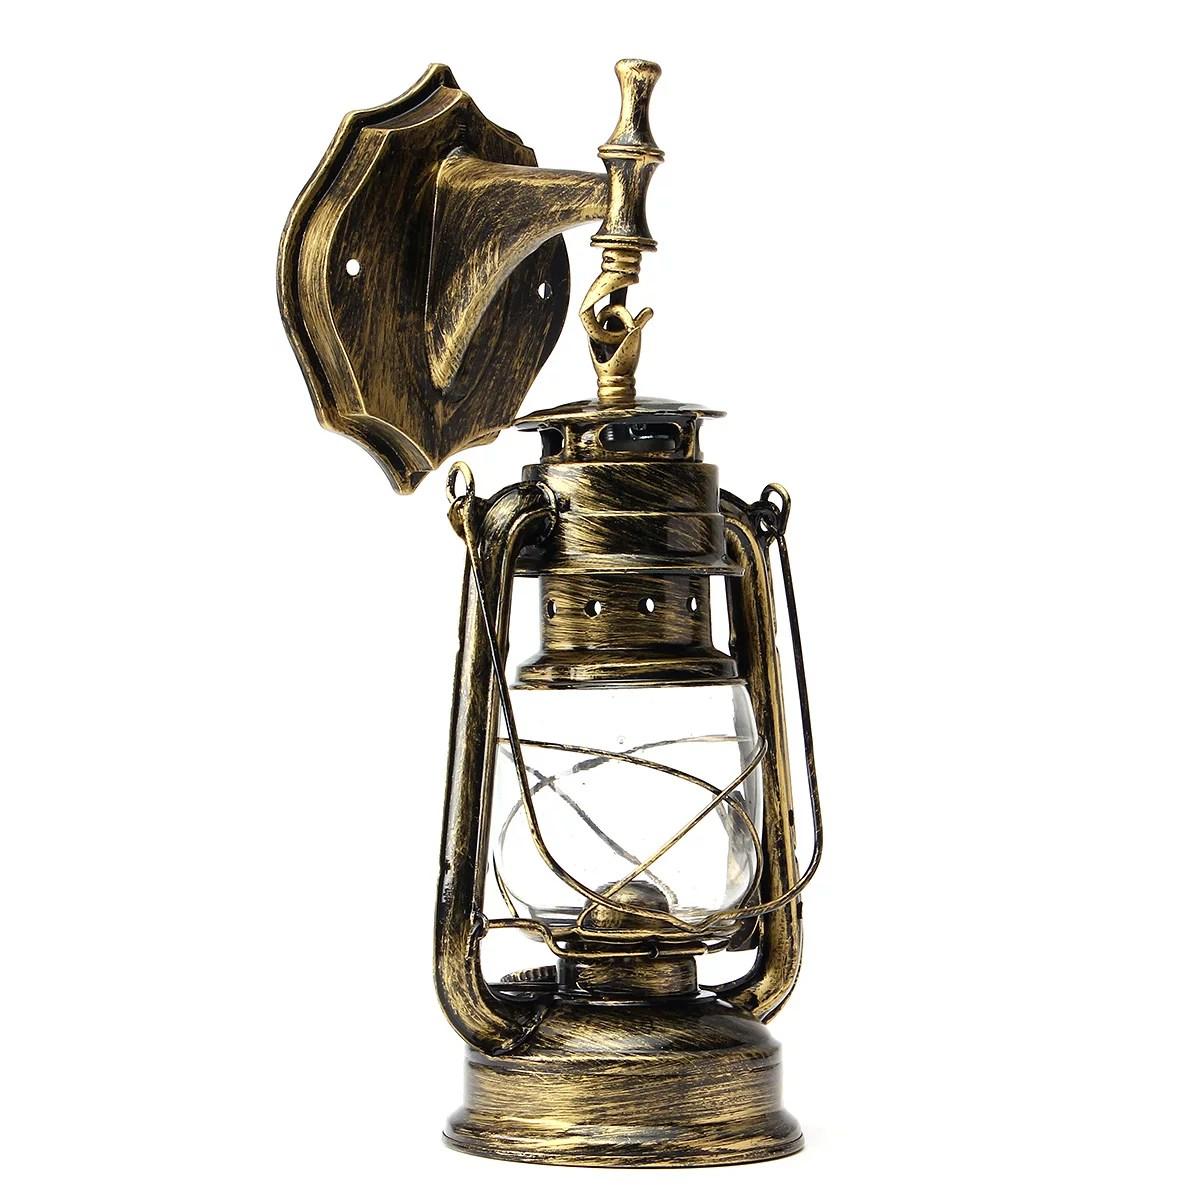 retro wall lighting sconce vintage exterior lantern antique fixture mounted lamp fixture loft lamp metal lampshade fixture fitting diy wall lights